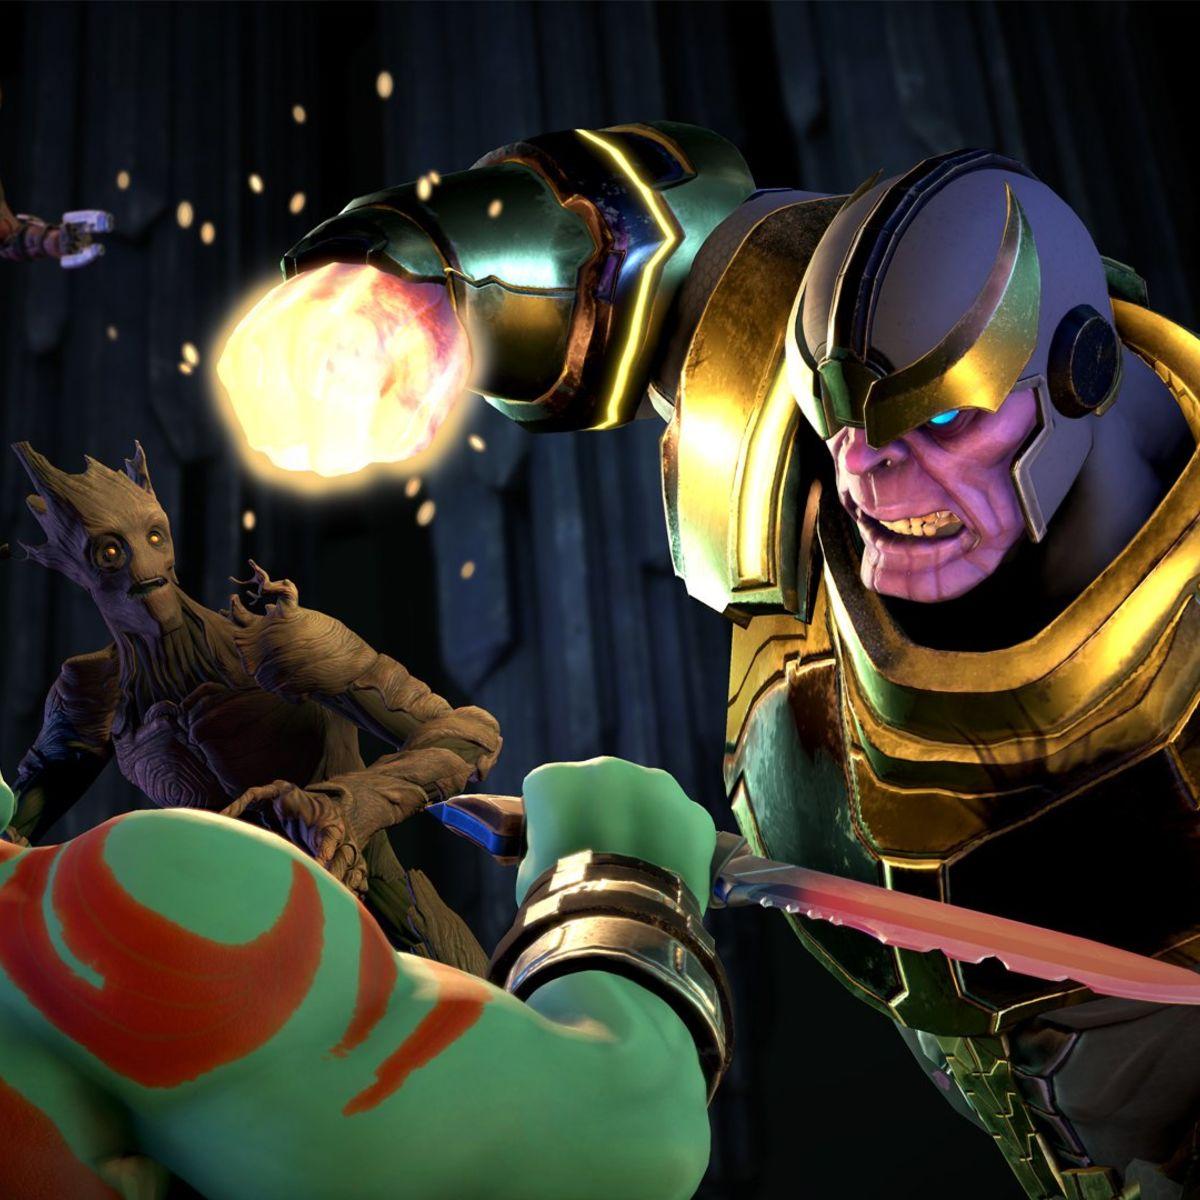 Telltale-Guardians-of-the-Galaxy-Thanos_0.jpg